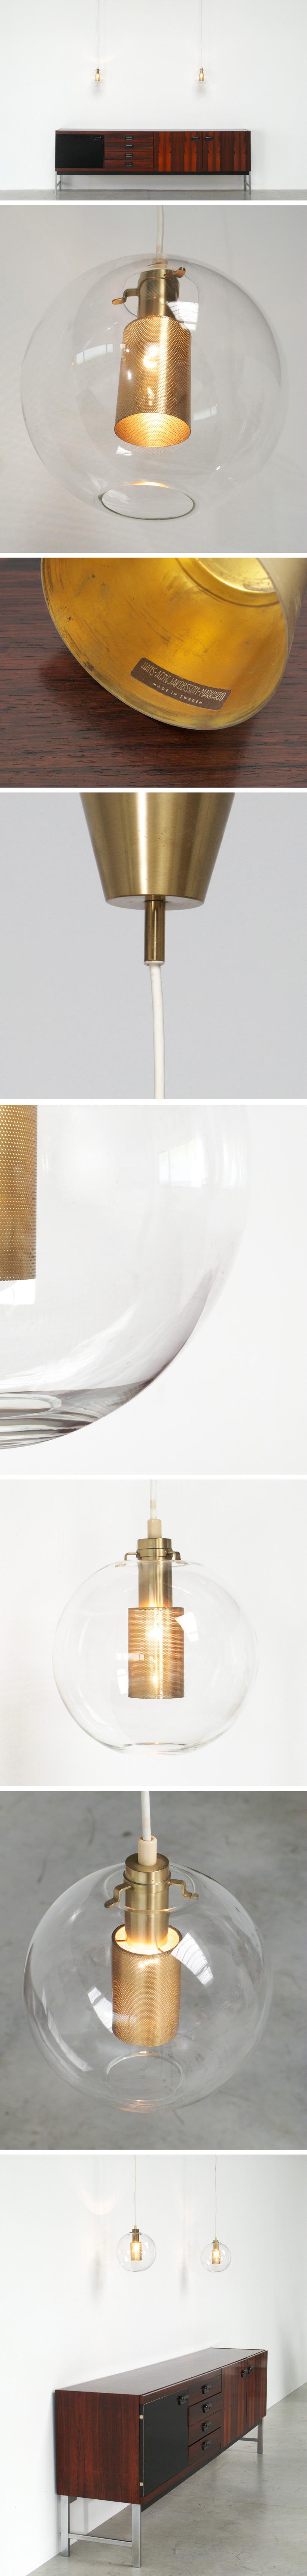 Hans Agne Jakobsson set of Glass Pendants AB Markaryd Large